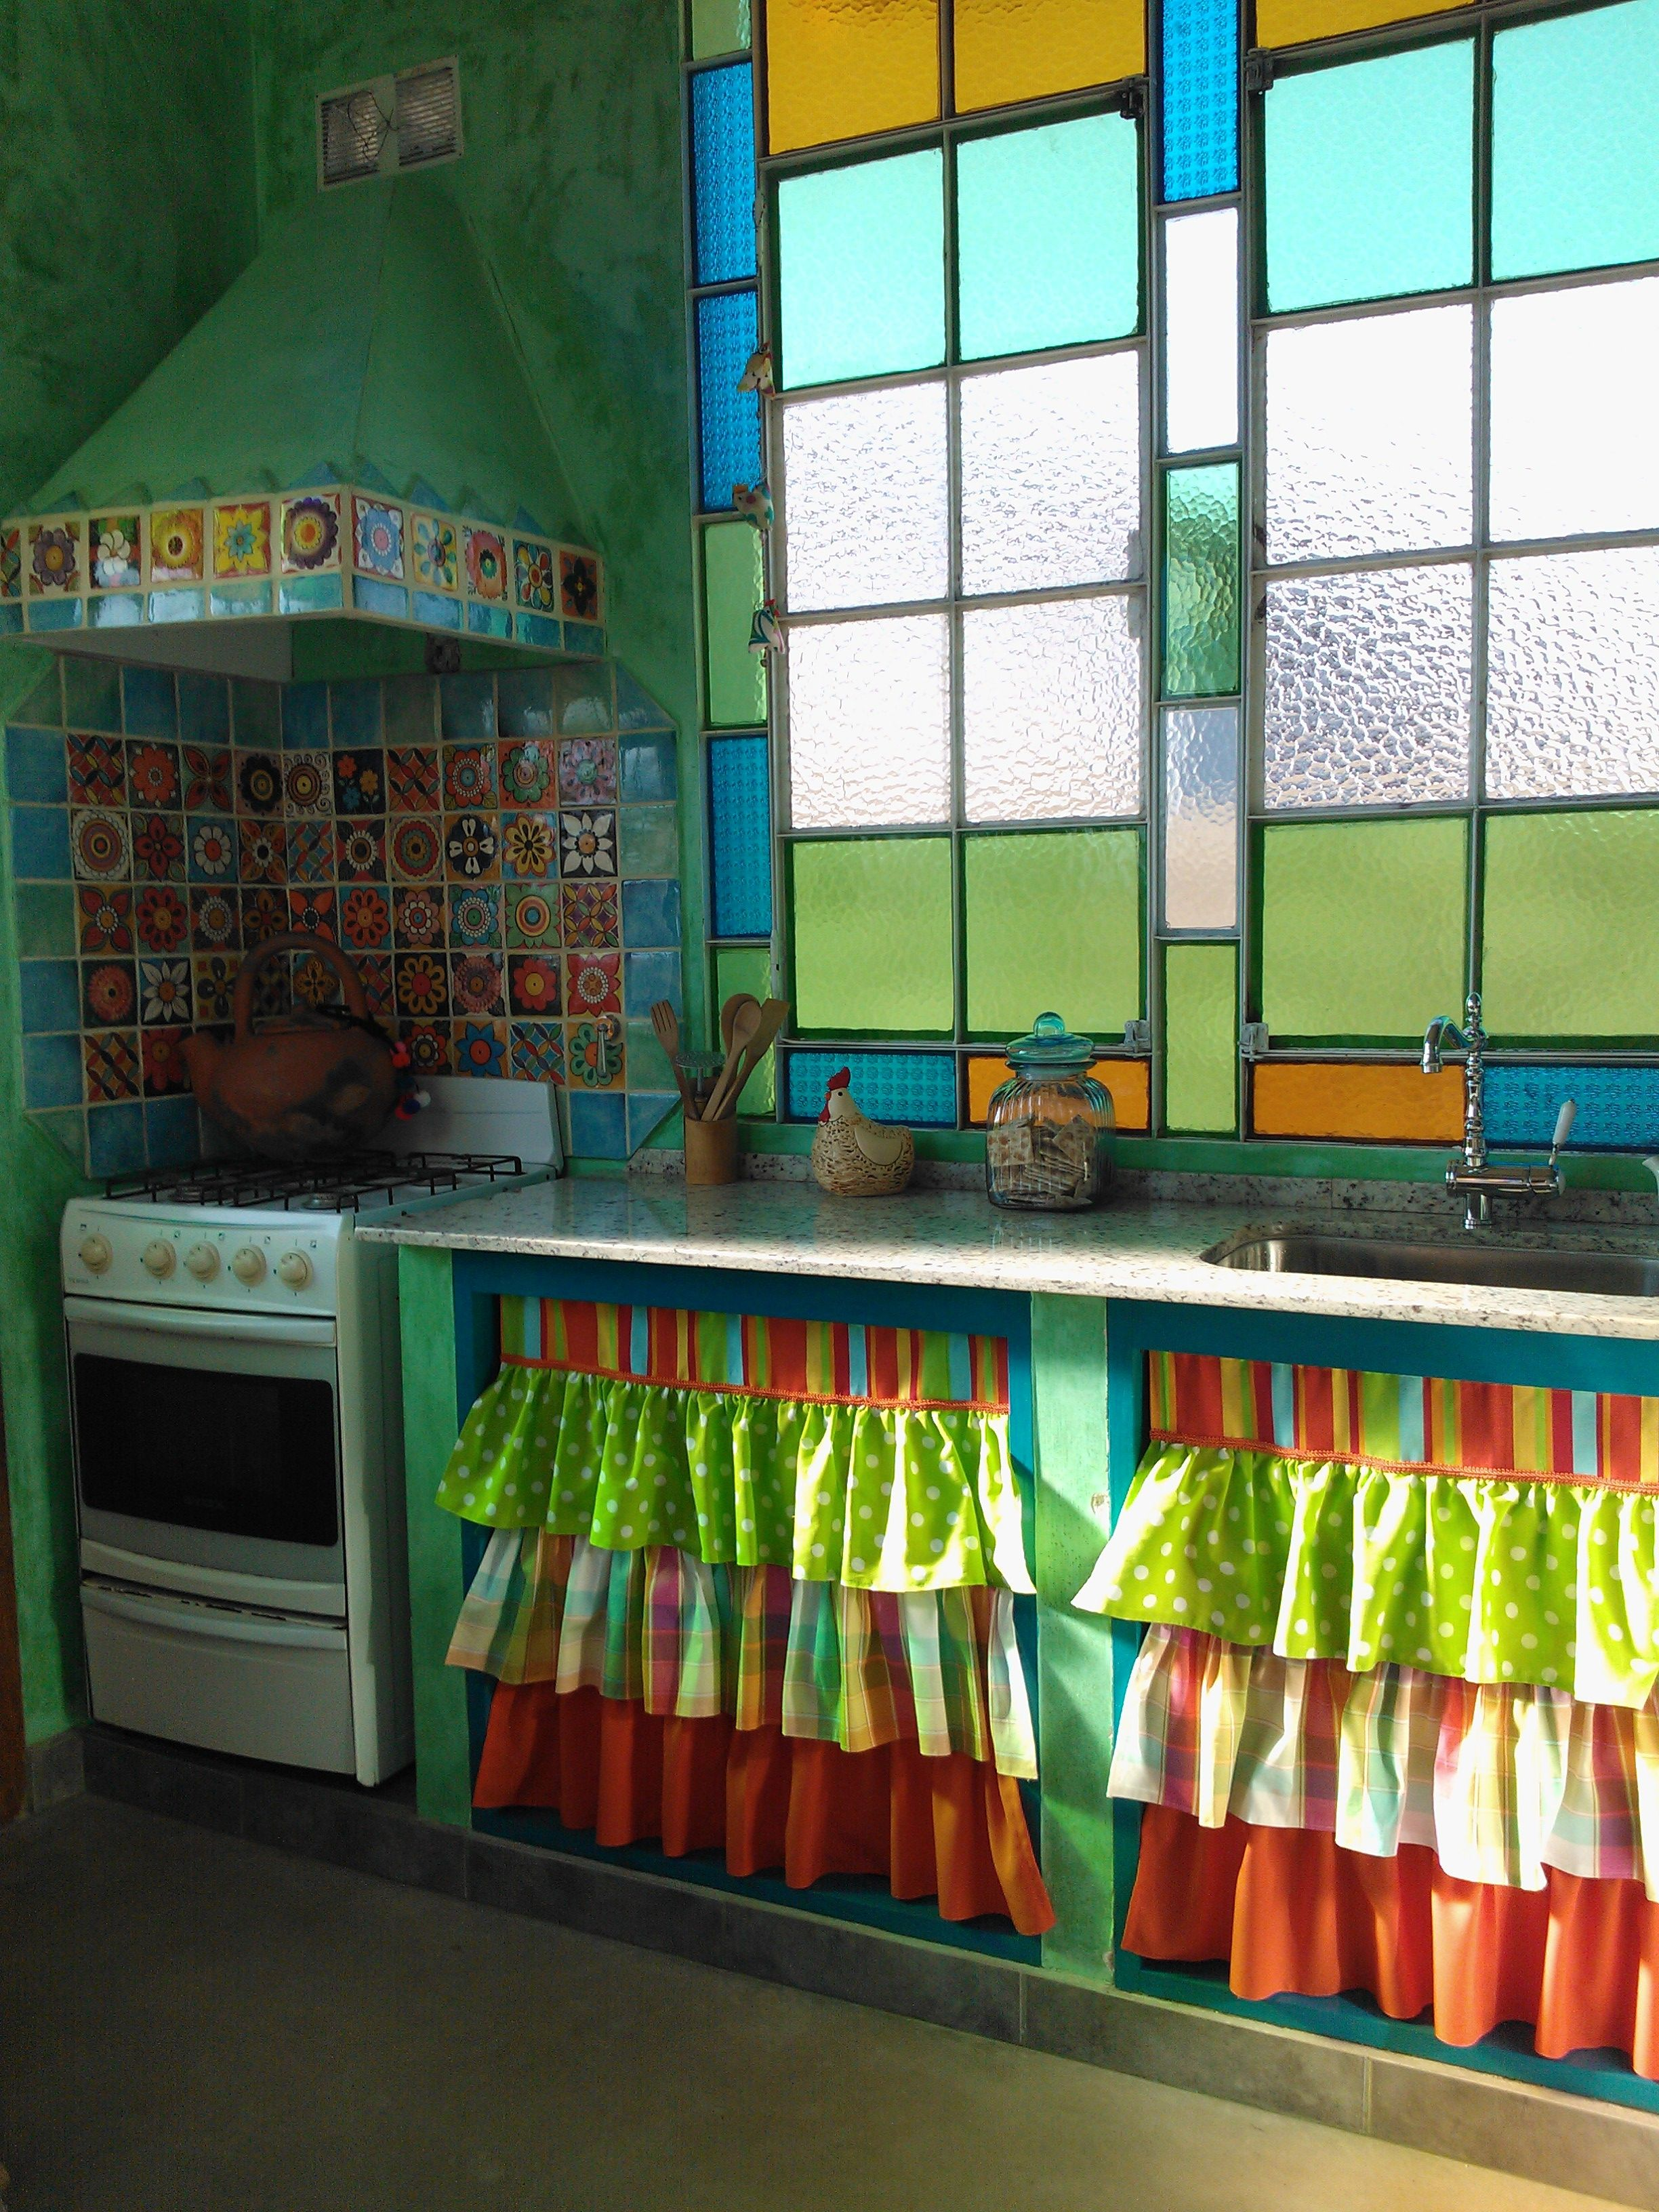 Cocina estilo Julieta Be. Cortina hecha por mi! | Baño | Pinterest ...